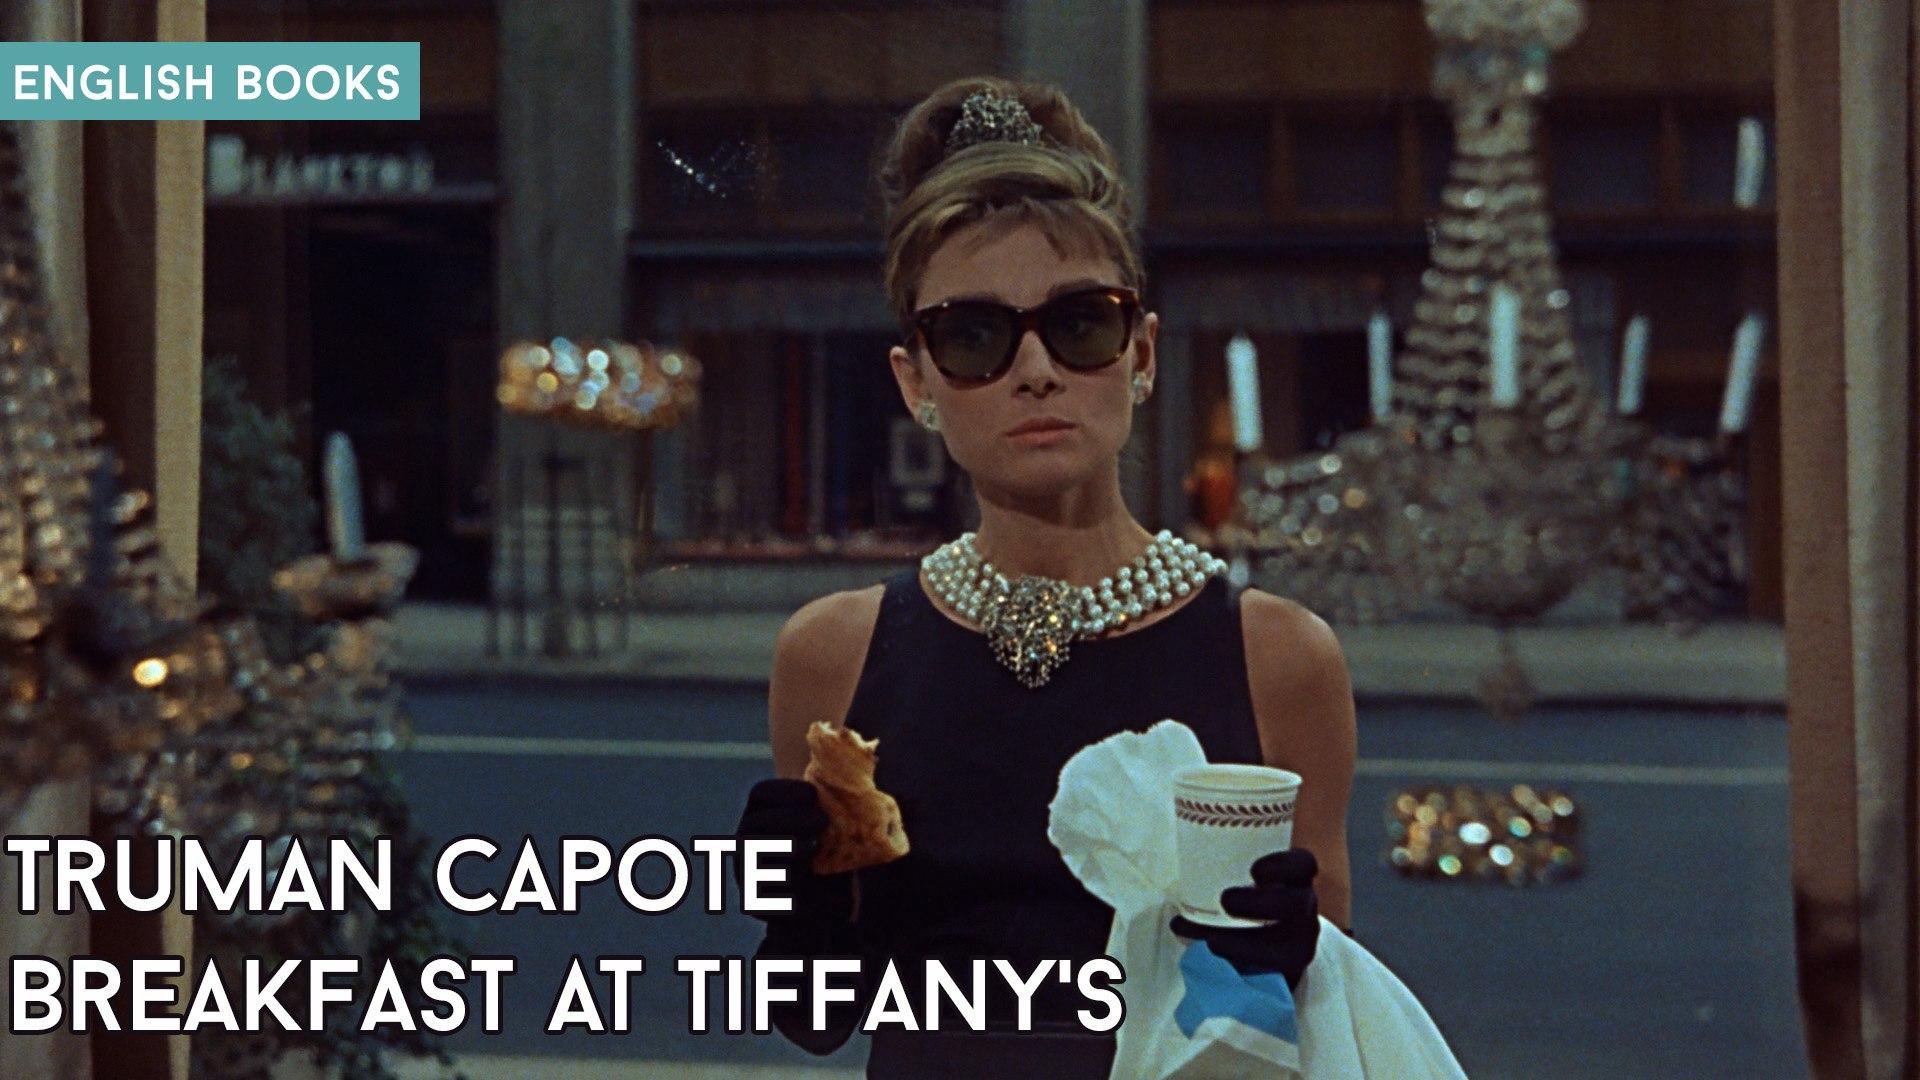 Truman Capote — Breakfast At Tiffany's